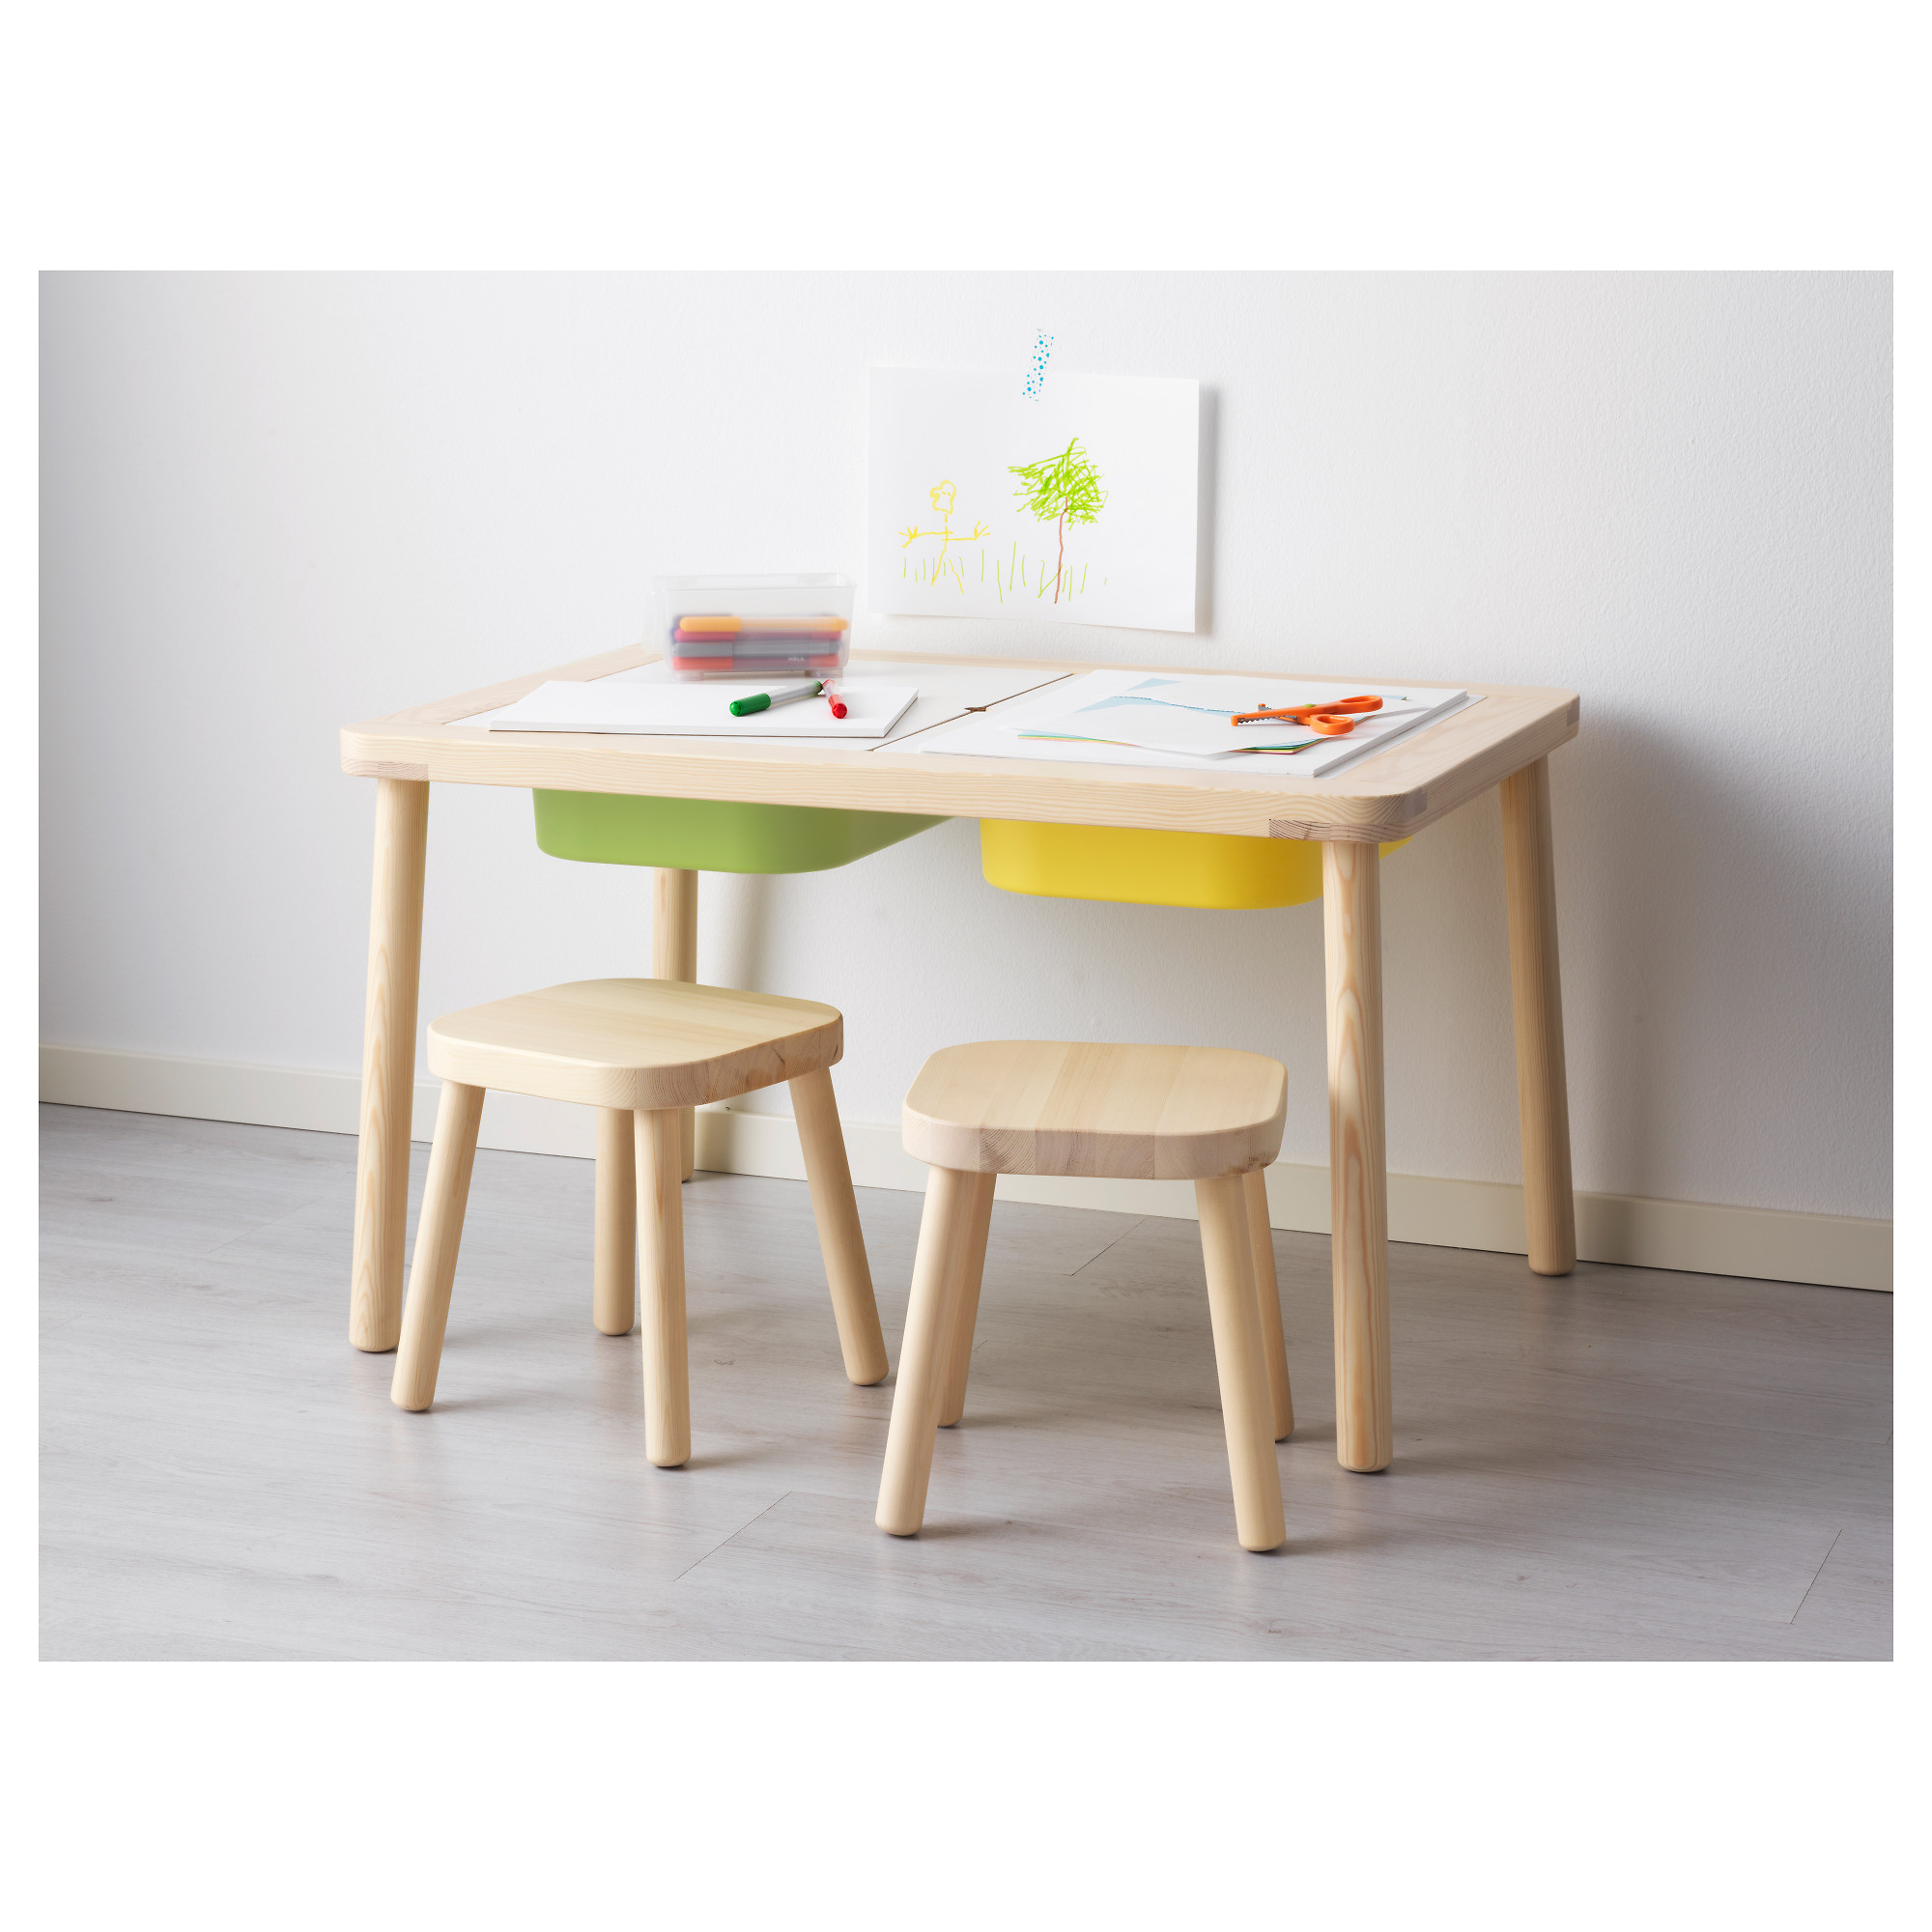 Magnificent Flisat Childrens Table Ikea Hong Kong Unemploymentrelief Wooden Chair Designs For Living Room Unemploymentrelieforg